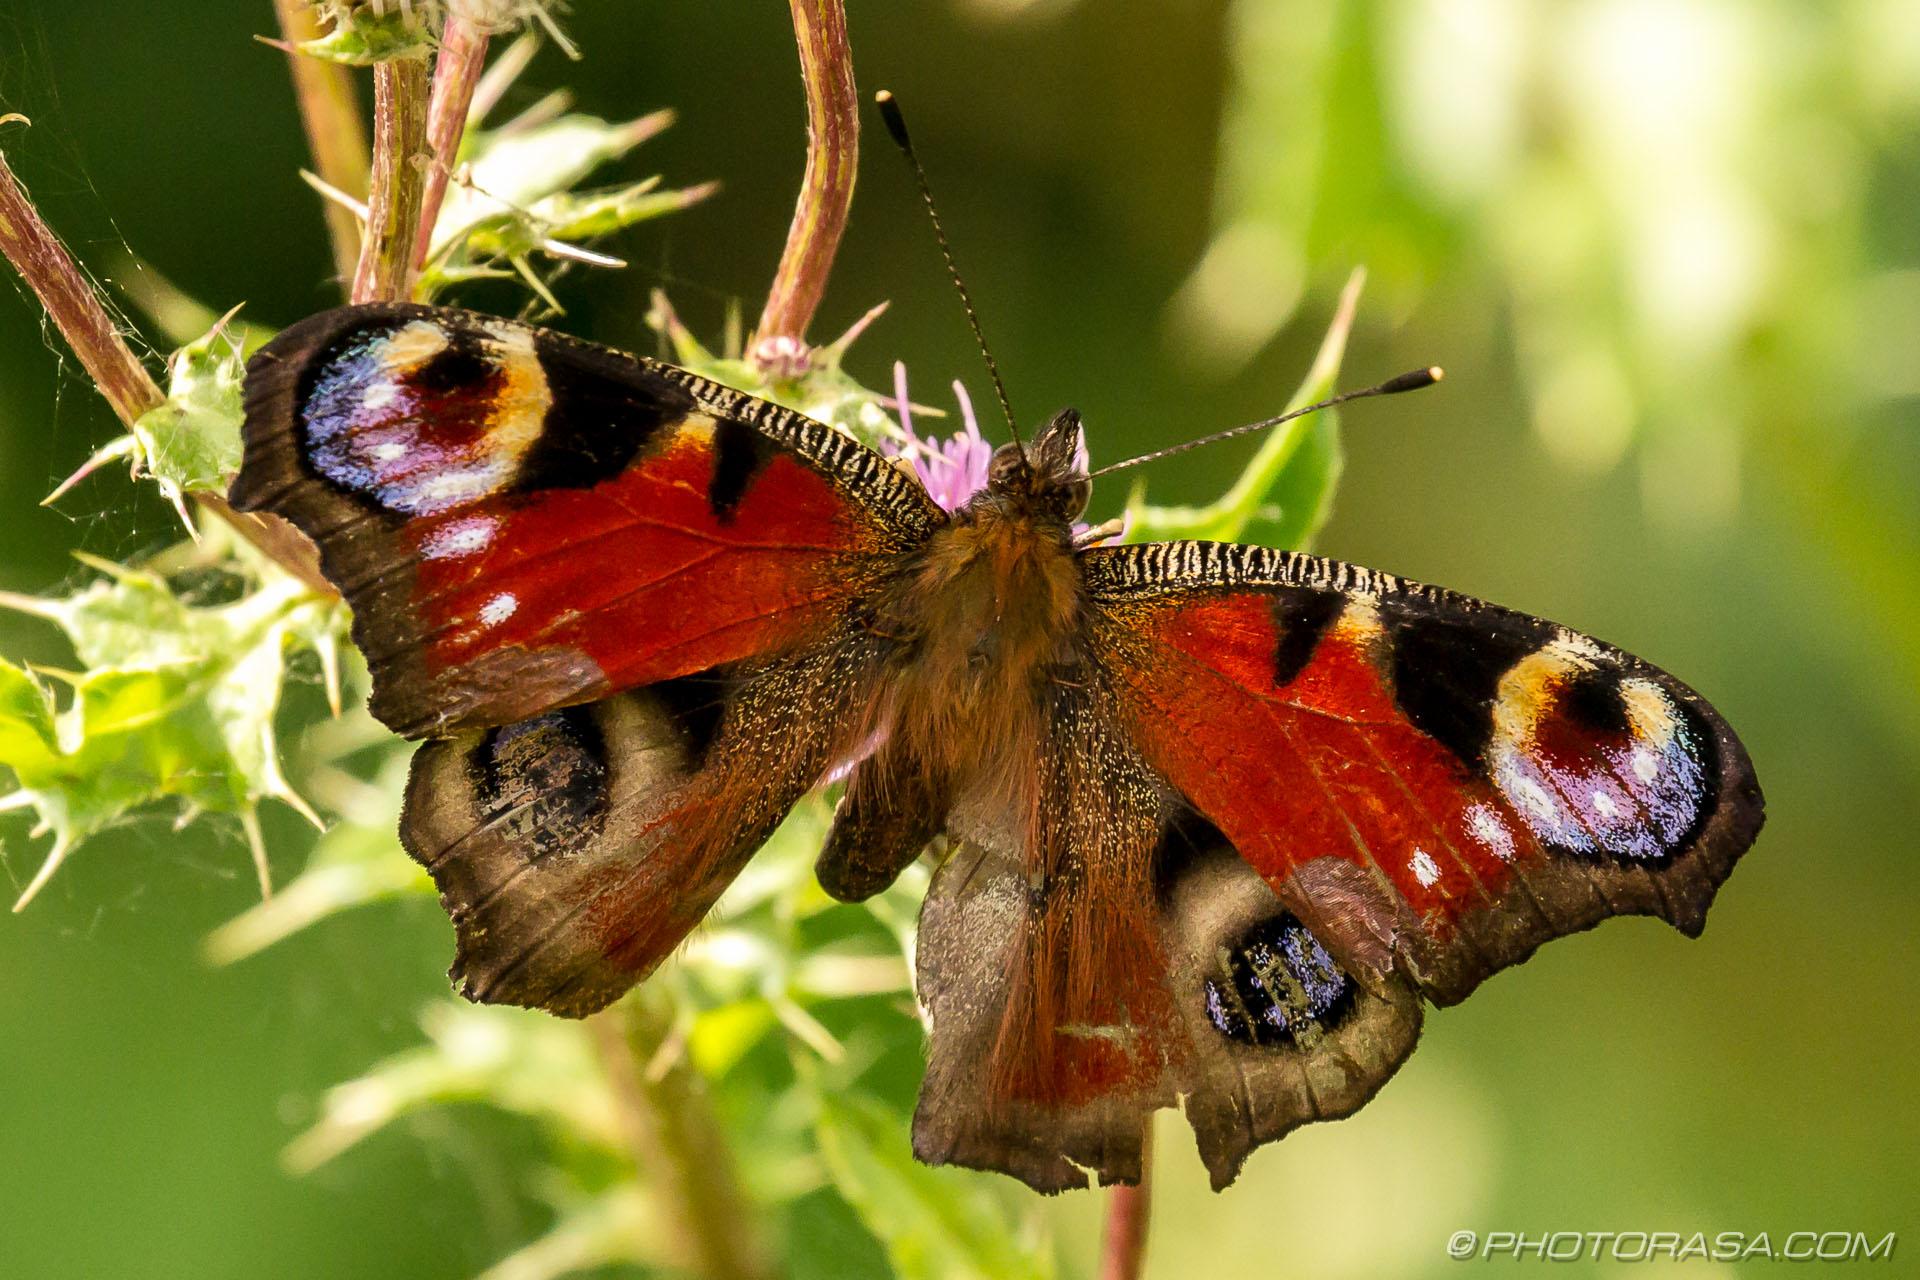 https://photorasa.com/peacock-butterfly/female-peacock-butterfly/